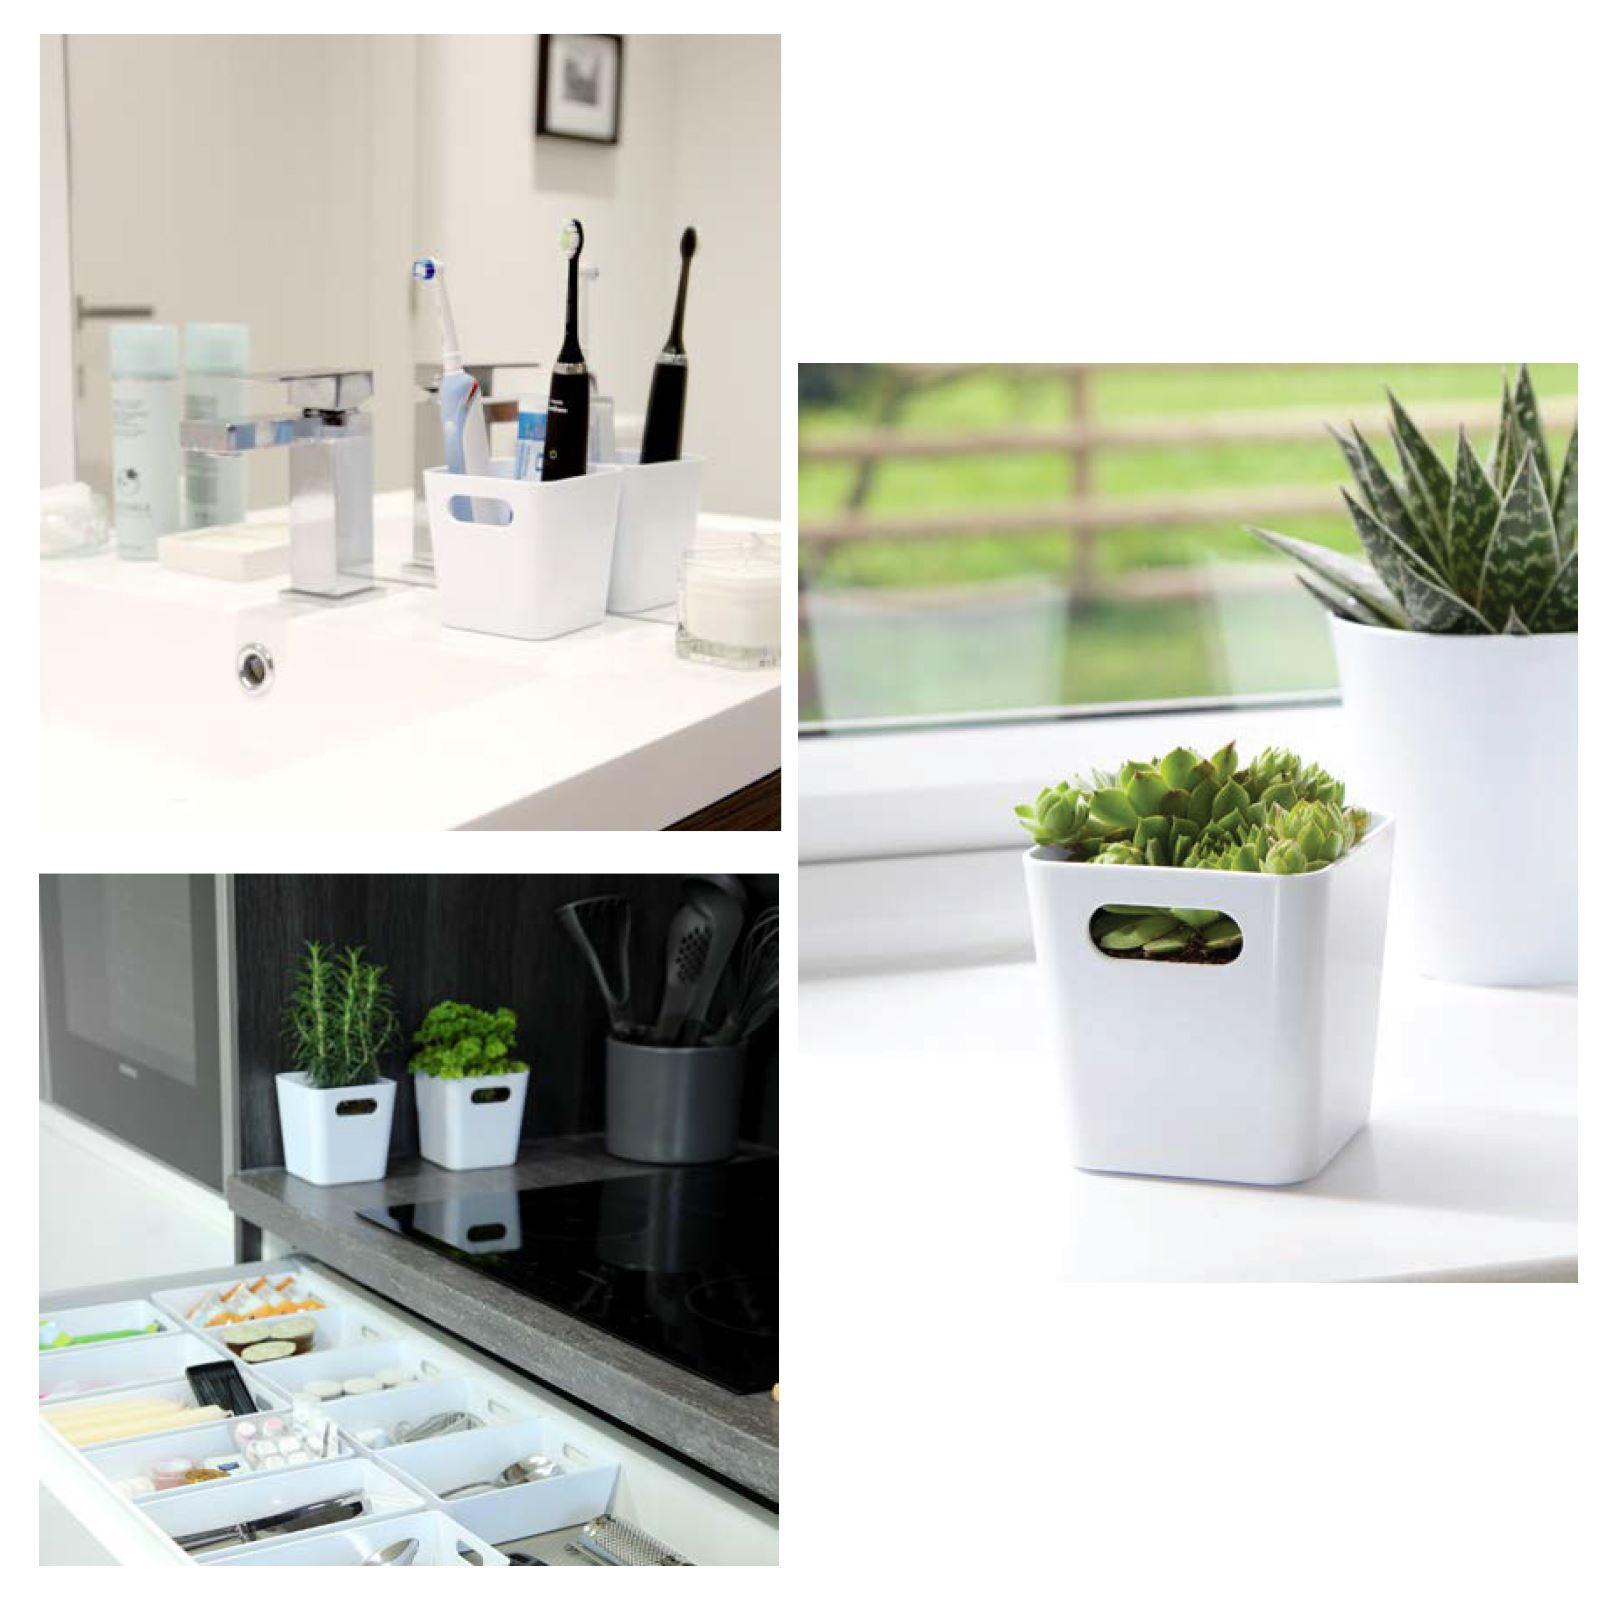 Plastic-Handy-Fruit-Vegetable-Home-Kitchen-Storage-Basket-Crate-Tidy-Organiser thumbnail 3